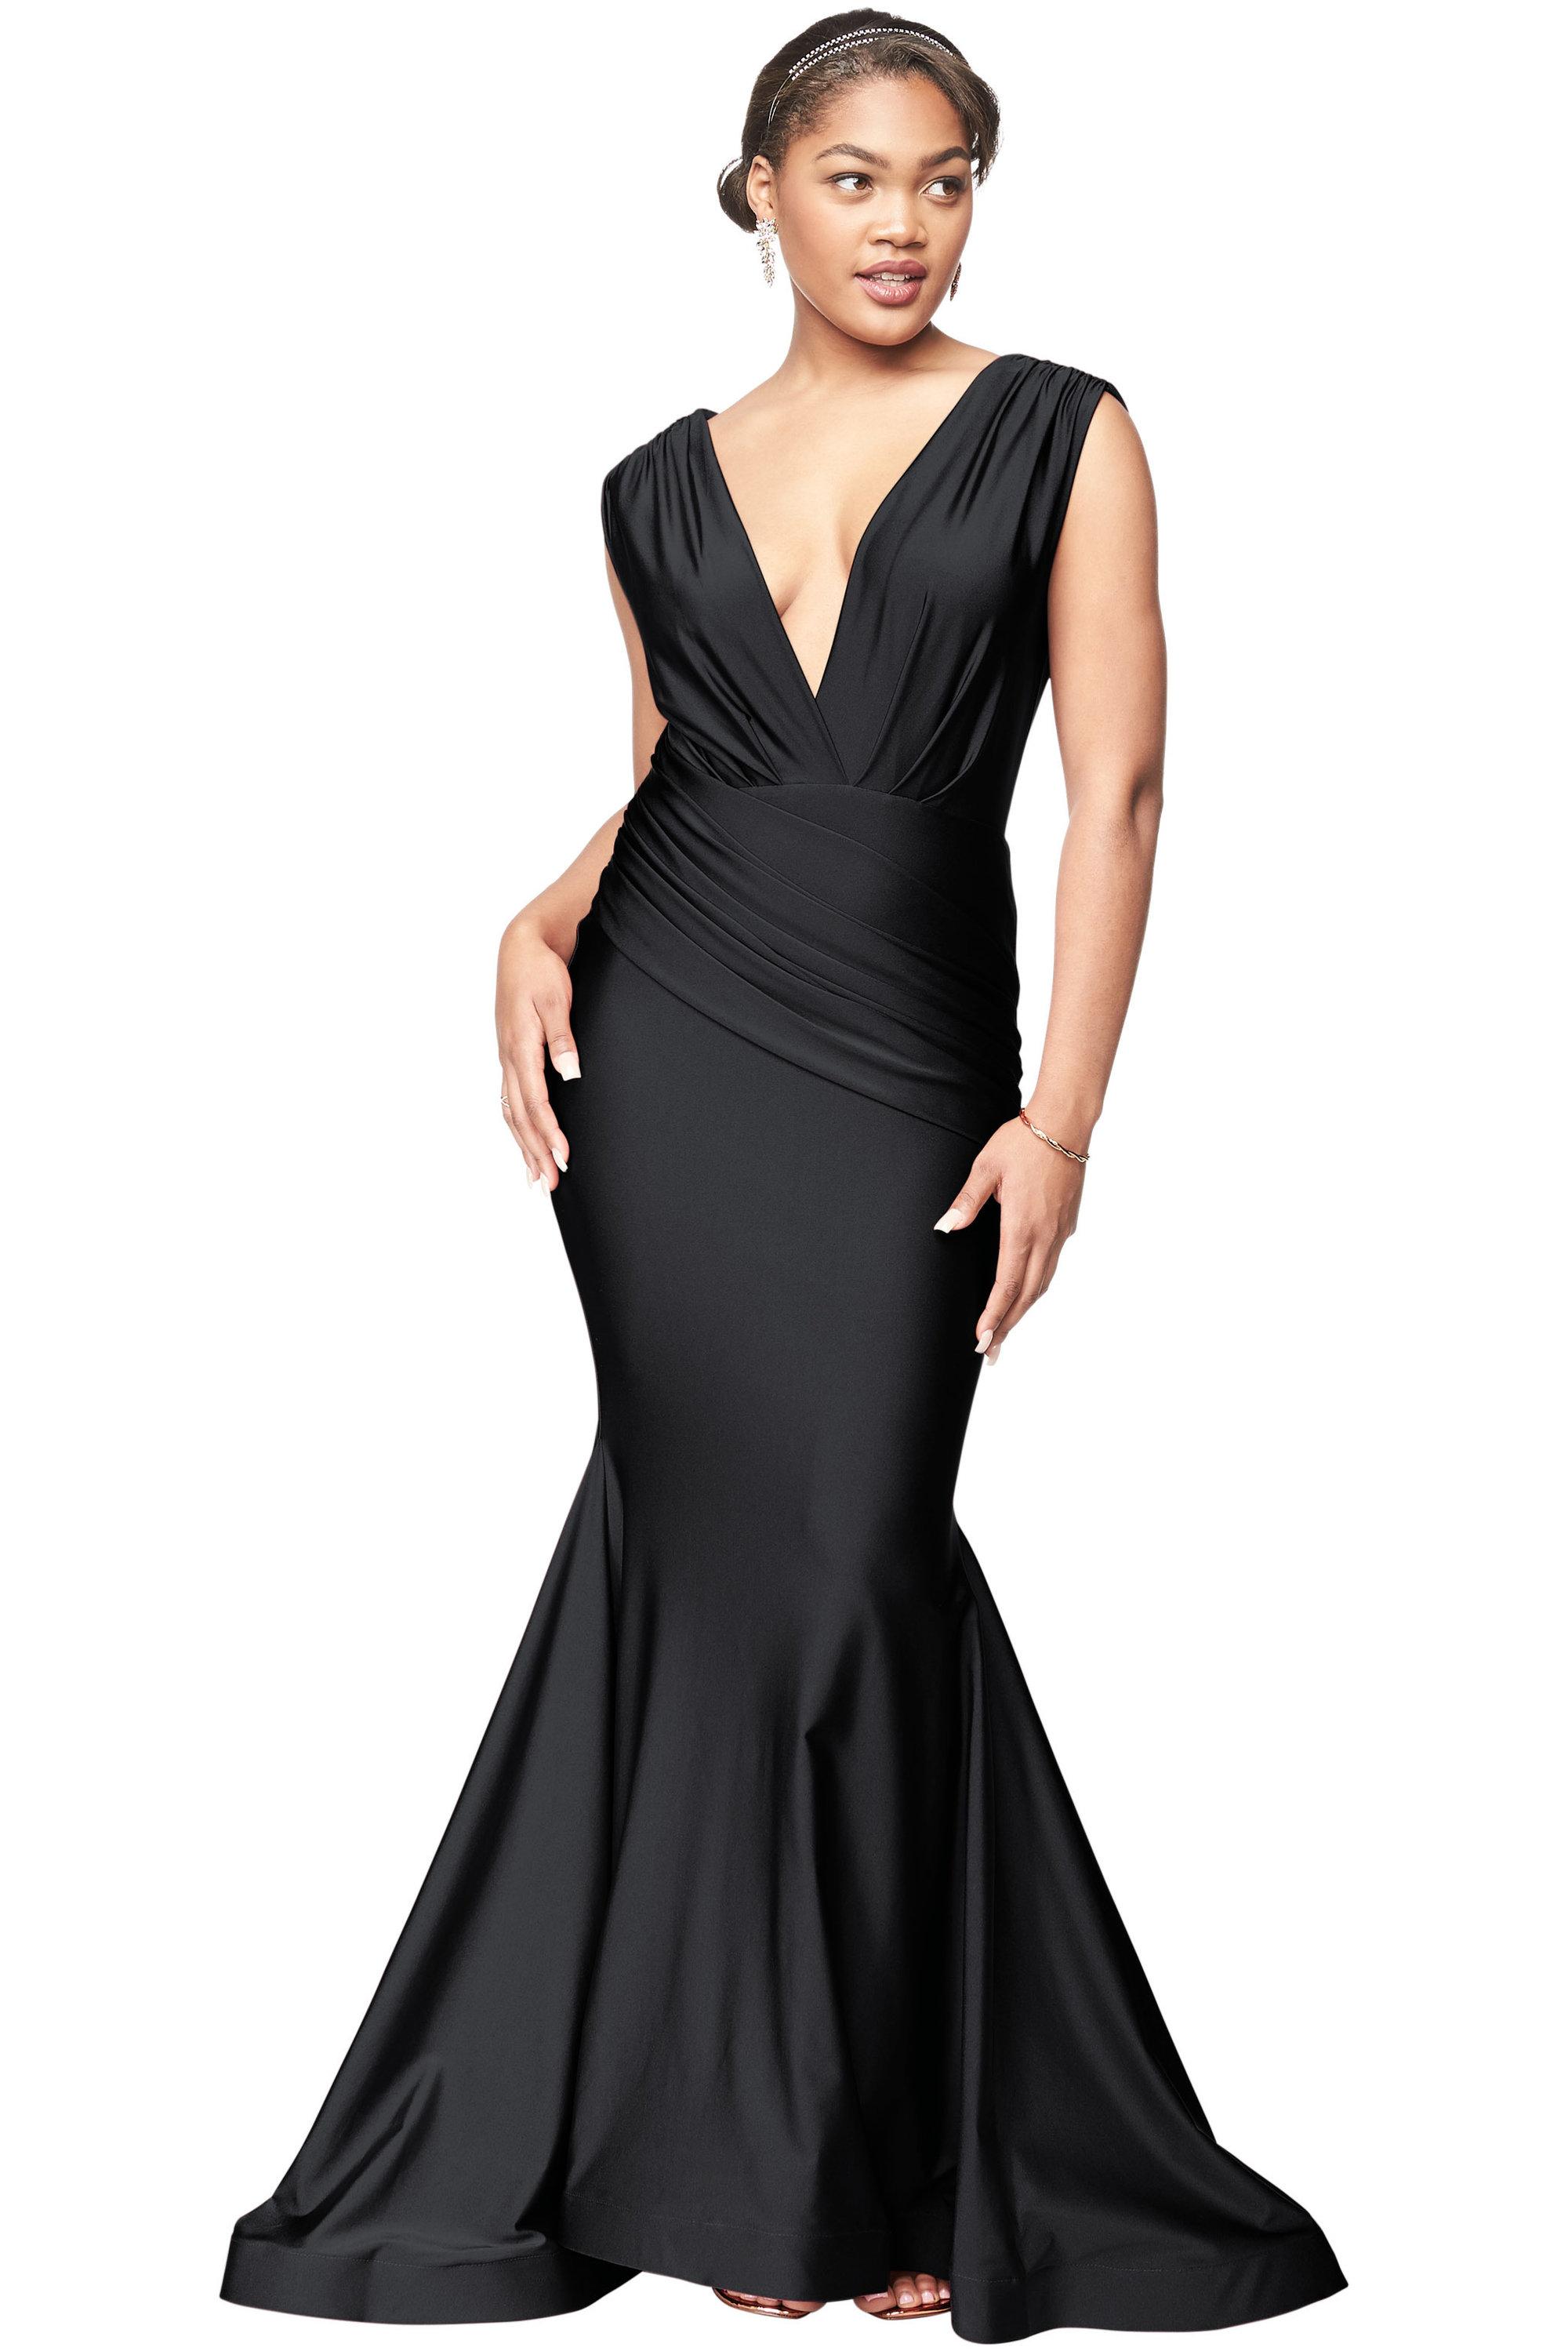 Bill Levkoff BLACK Stretch Satin V-Neck Mermaid gown, $278.00 Front